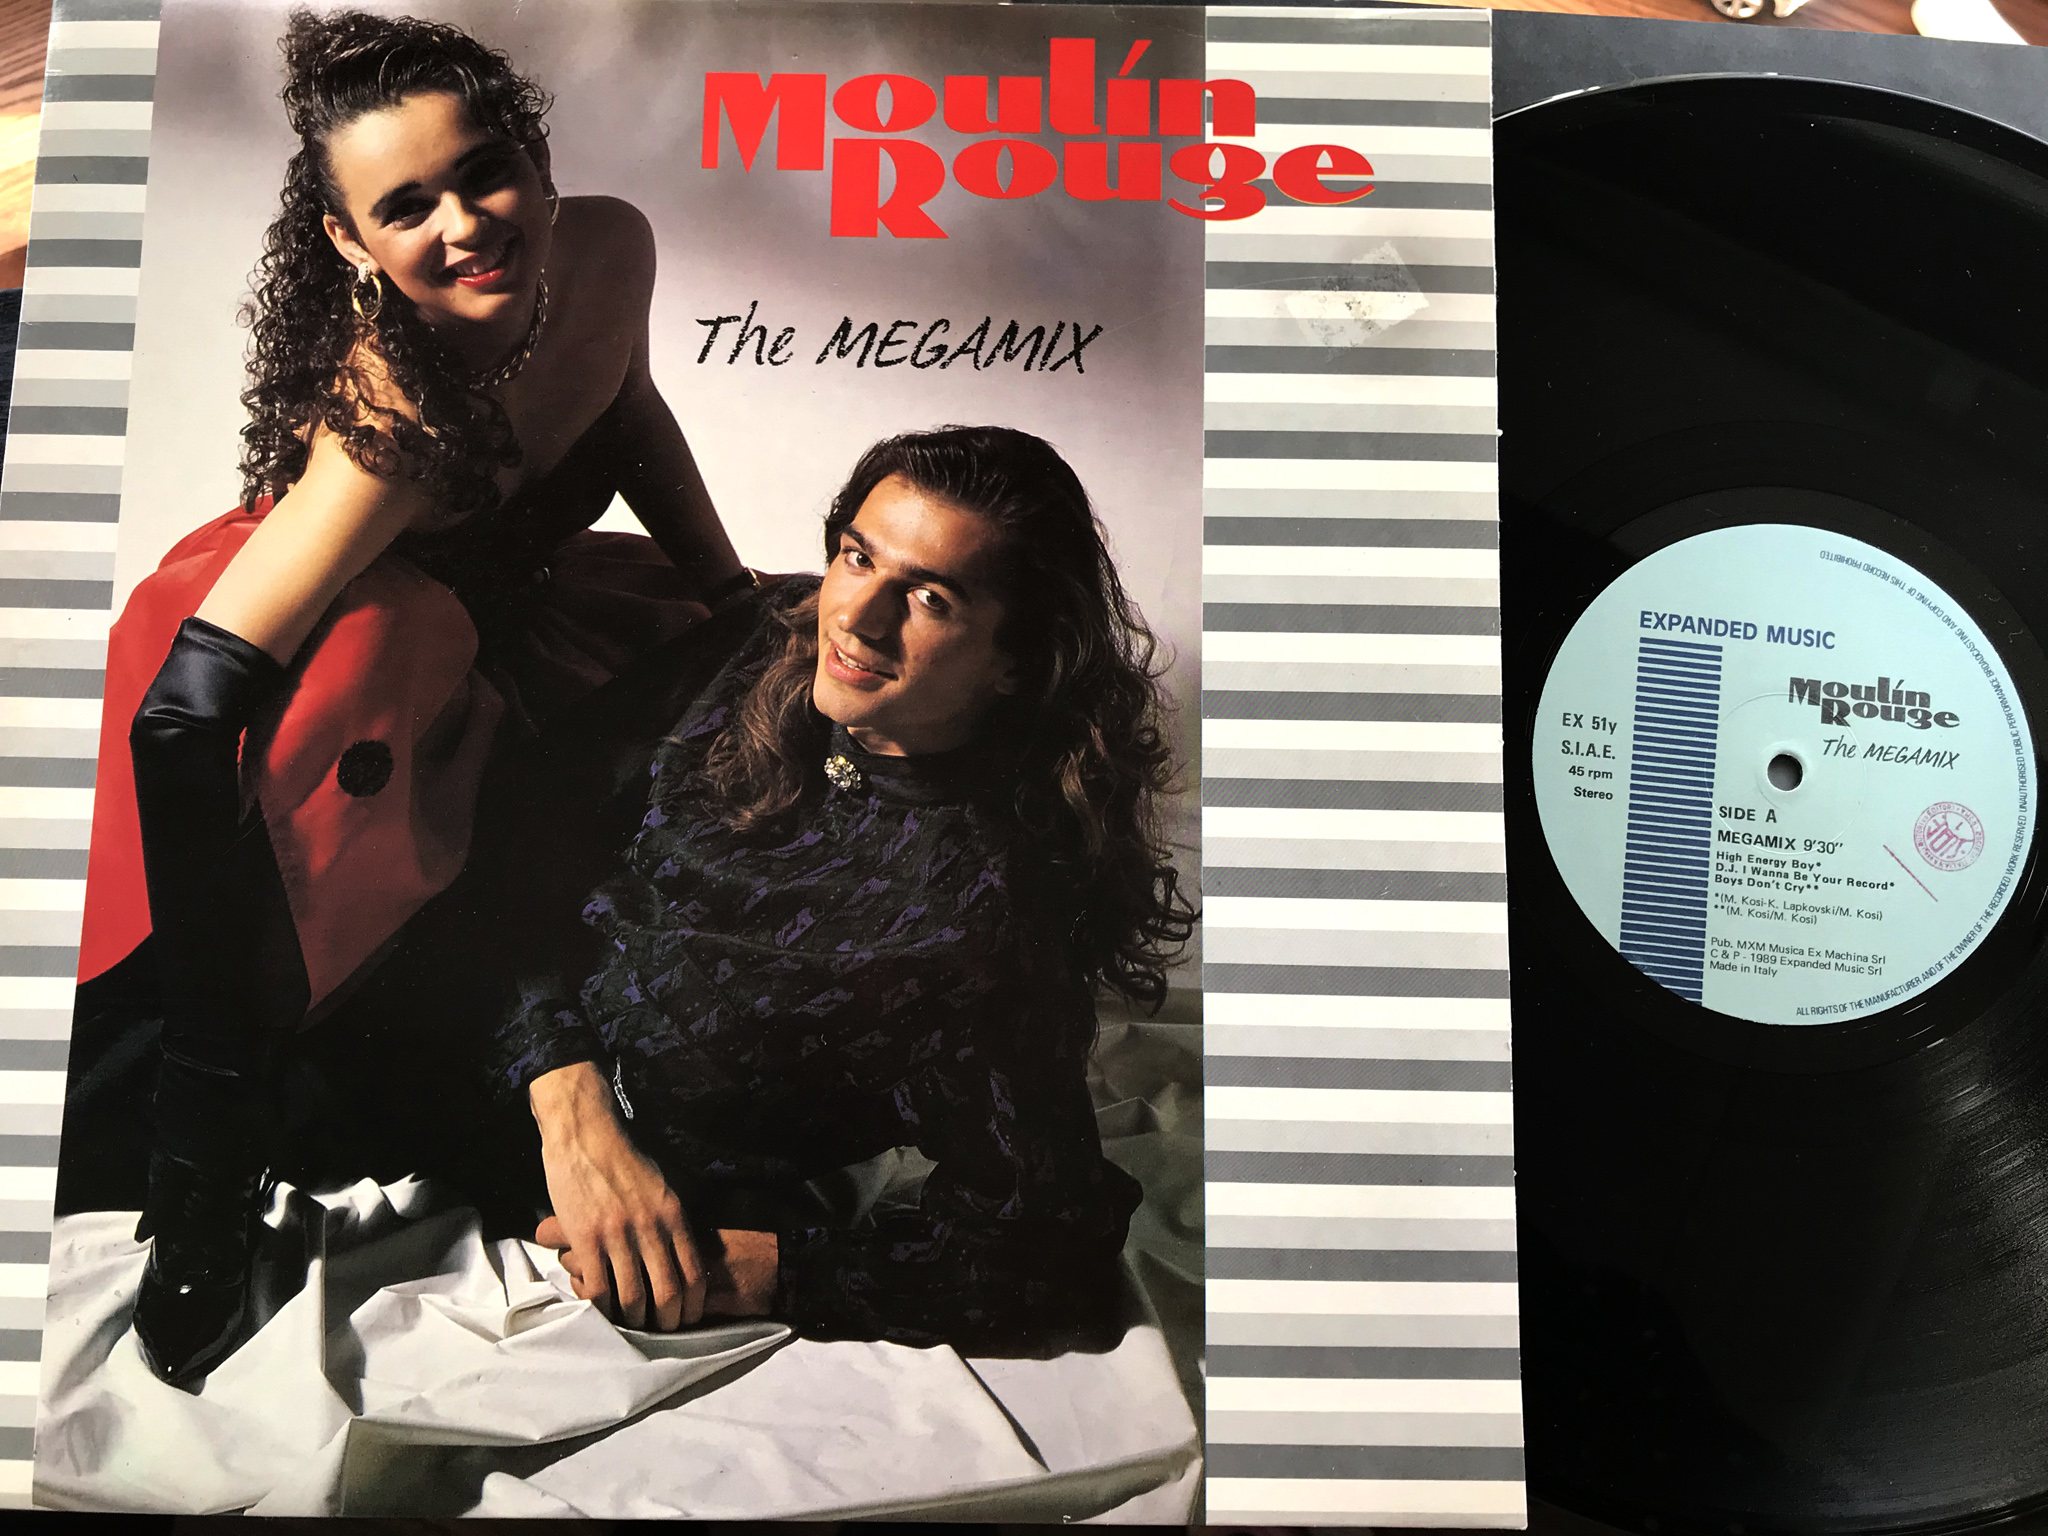 Moulin Rouge - The Megamix  High Energy Boy